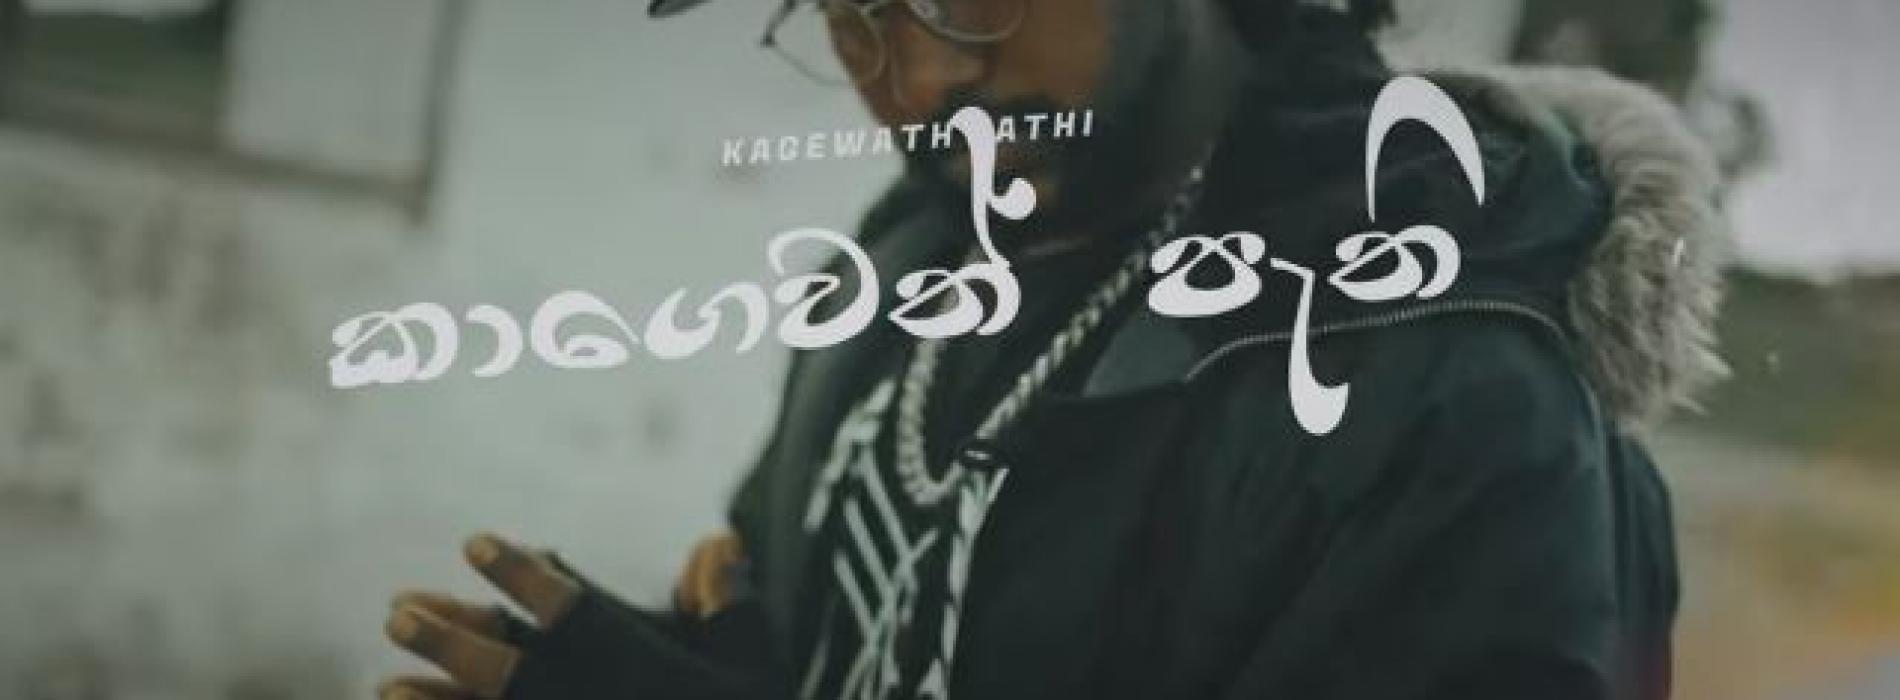 New Music : Kagewath Pathi (කාගෙවත් පැති) – Perez – Official Music Video